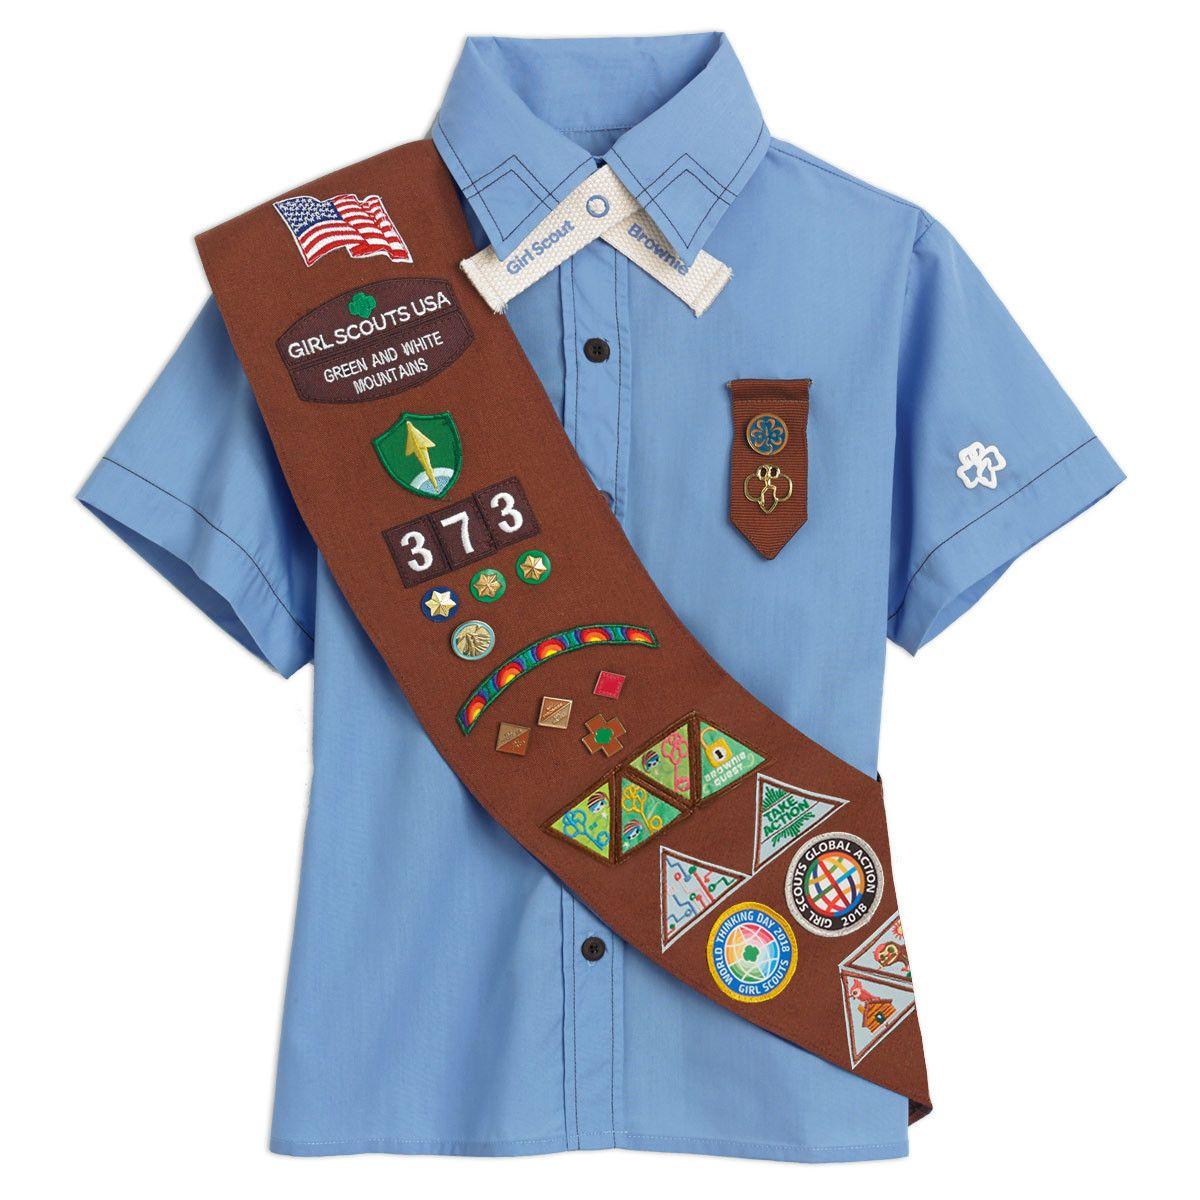 EXTRA LONG Brownies Uniform New Sash and Badge Brownie